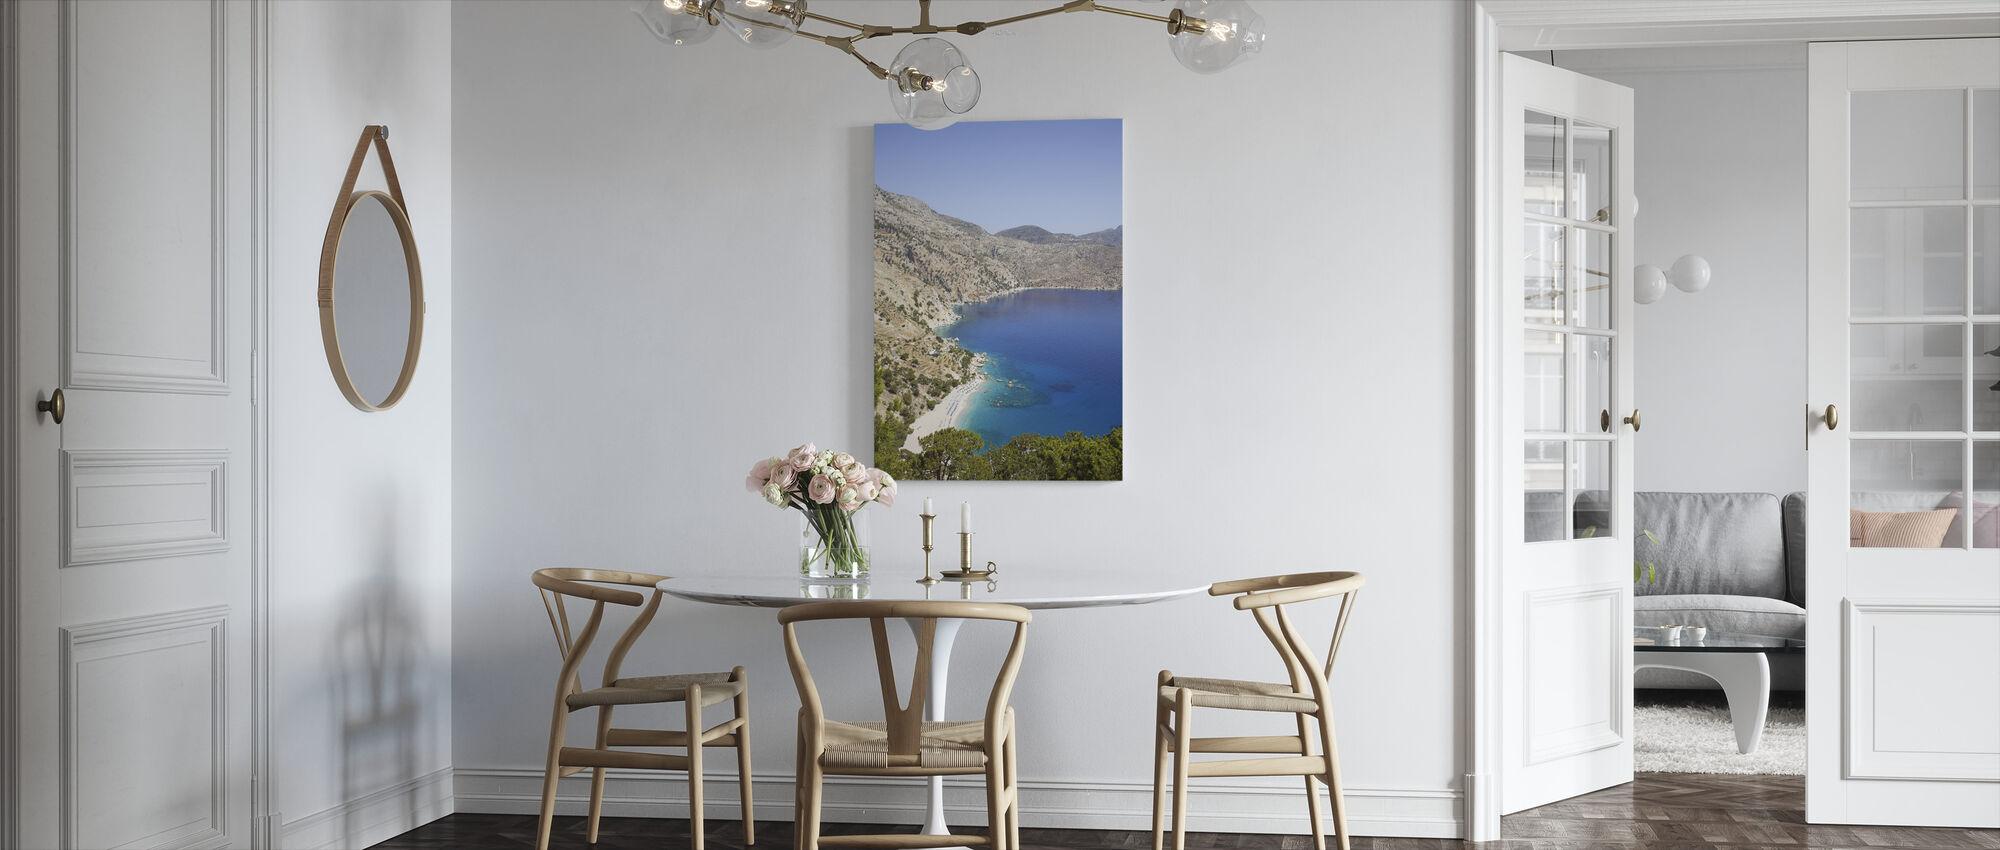 Karpathos Bergblick - Leinwandbild - Küchen